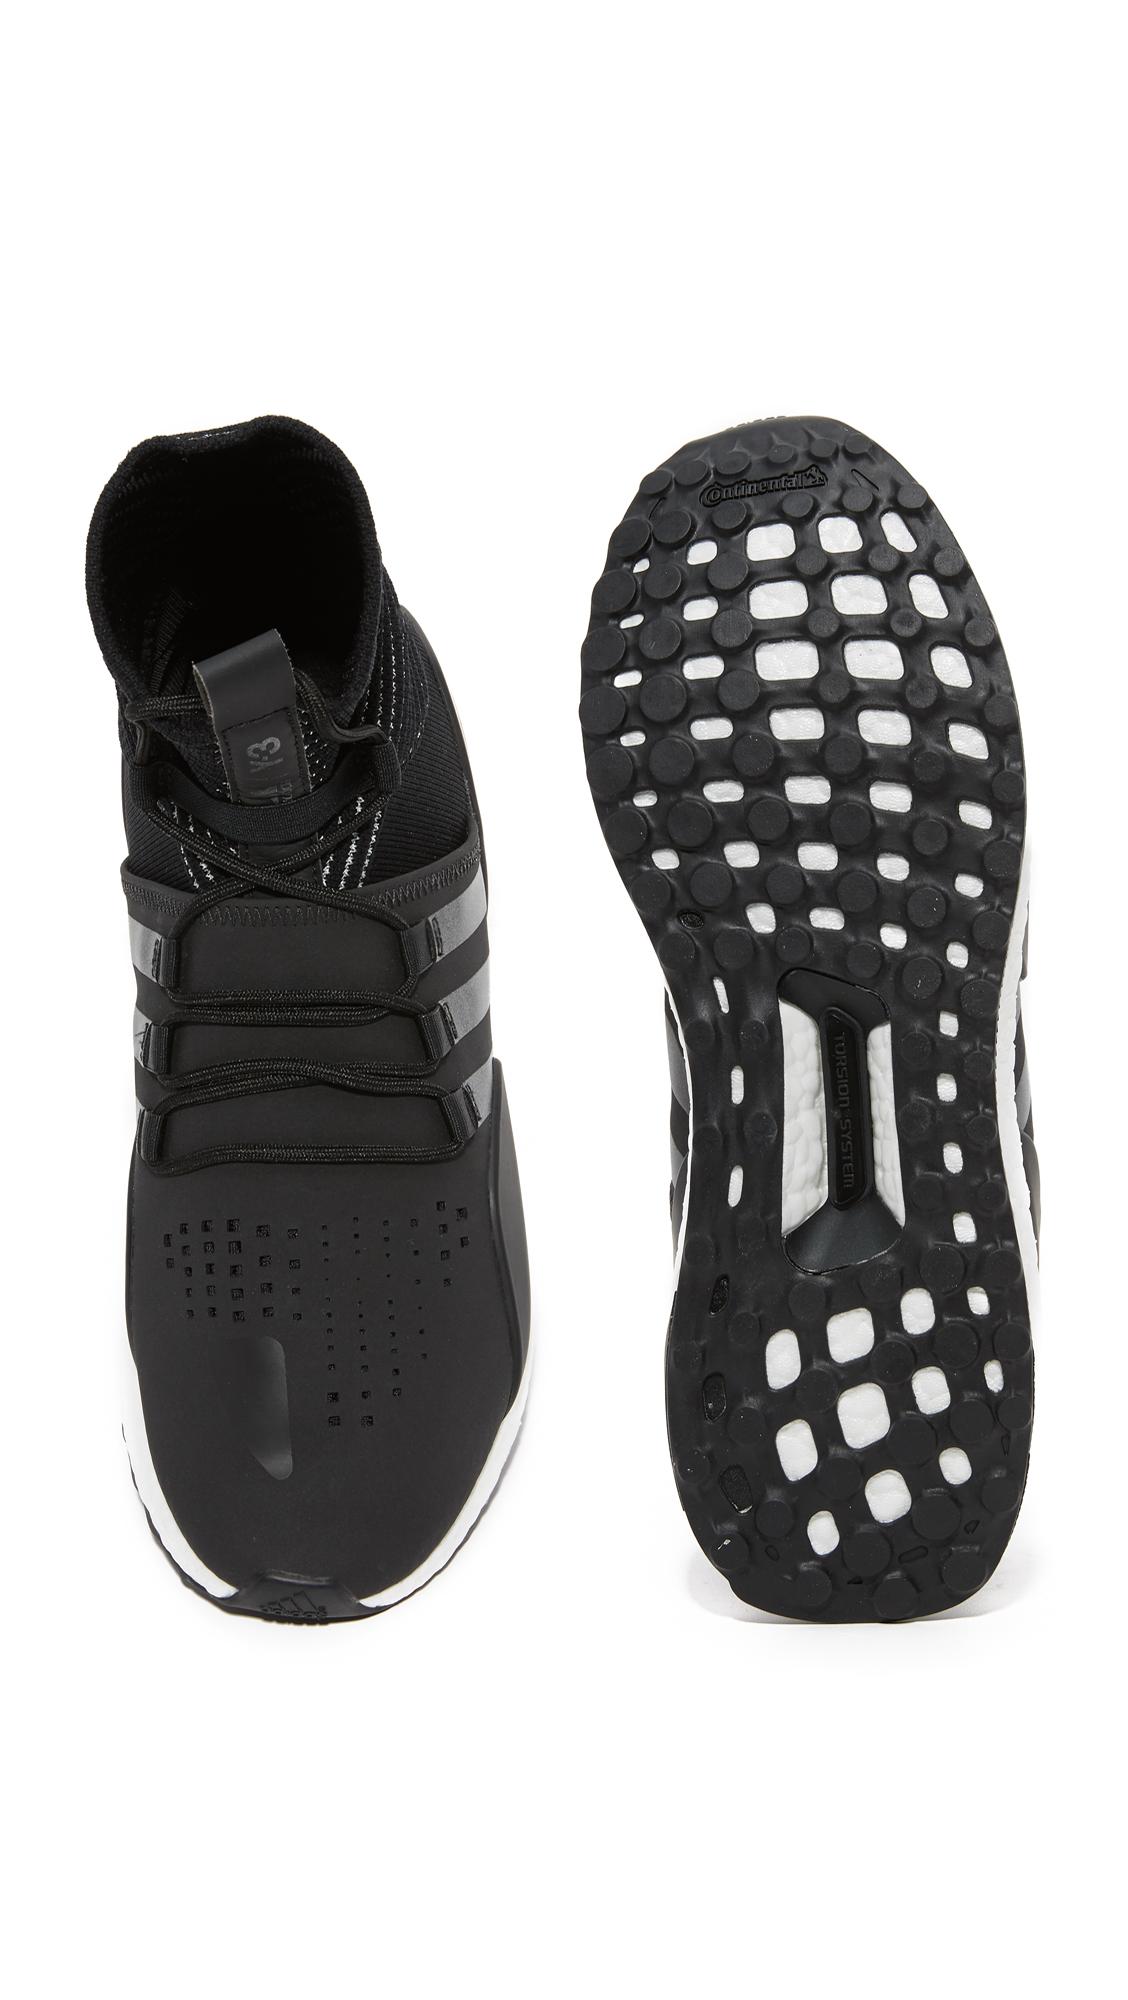 c7023fa70 Y-3 Sport Y-3S Approach Reflect Sneakers